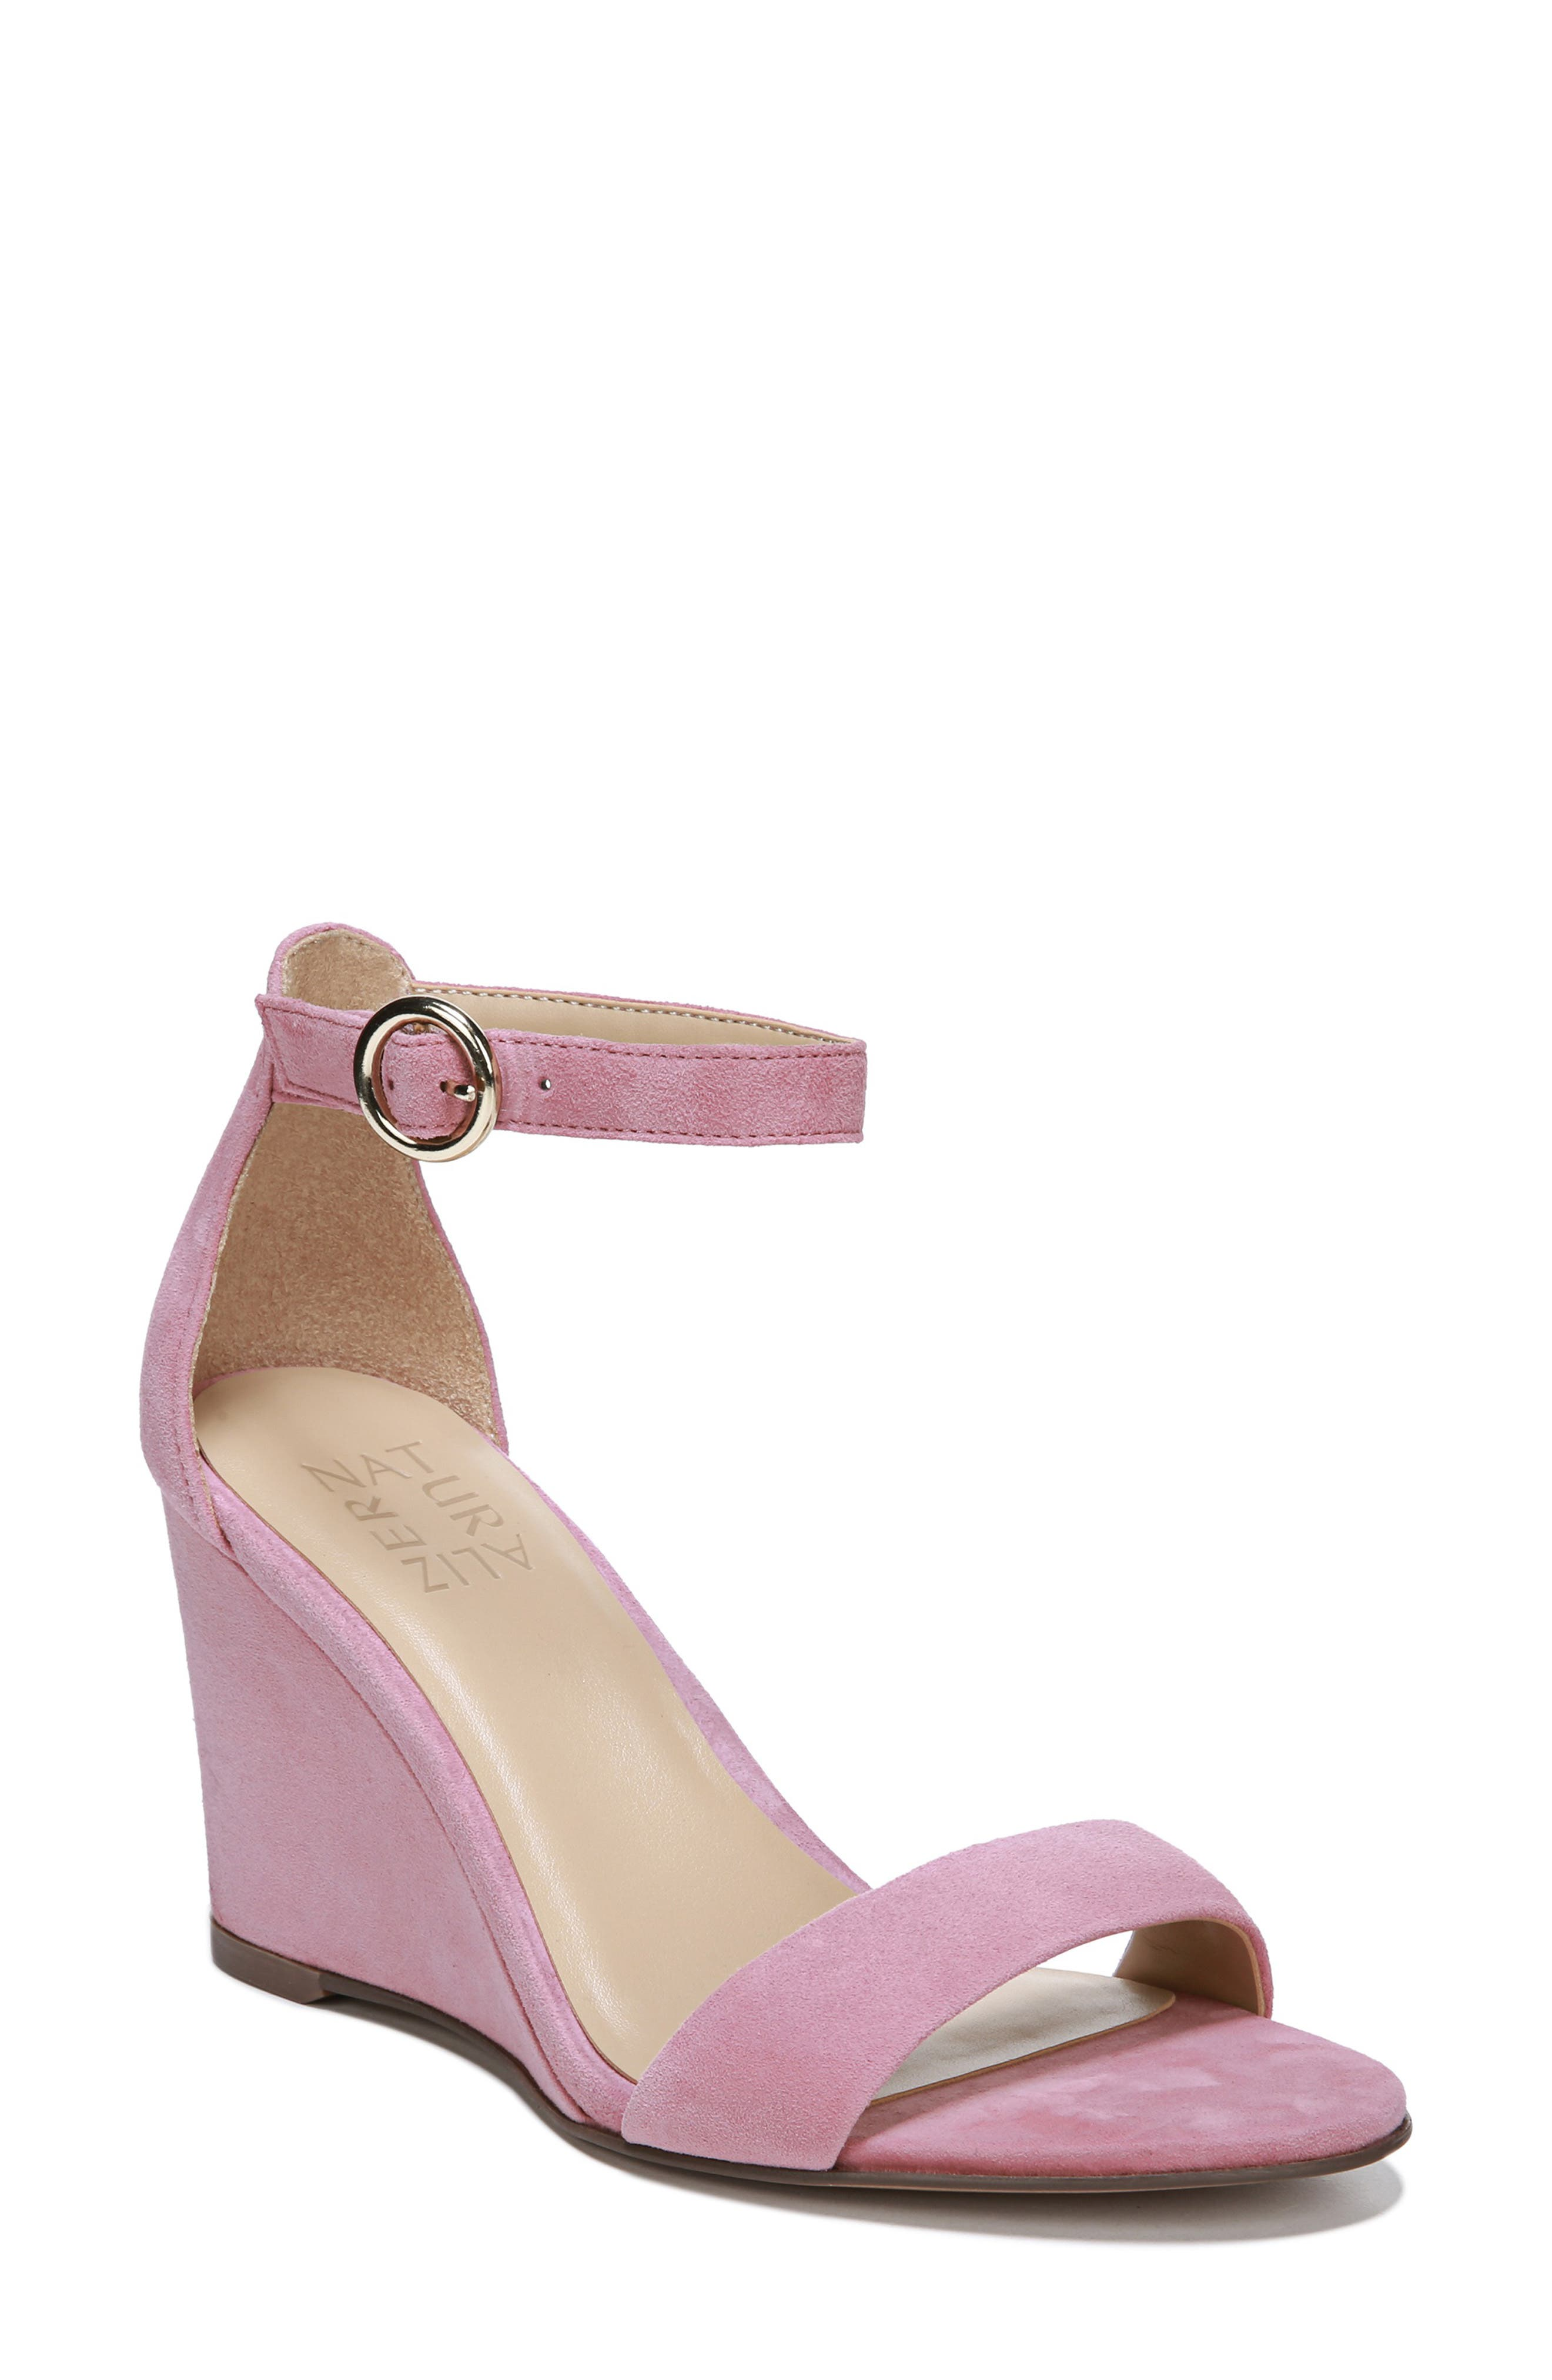 5acdd15878df Women s Naturalizer Wedge Sandals